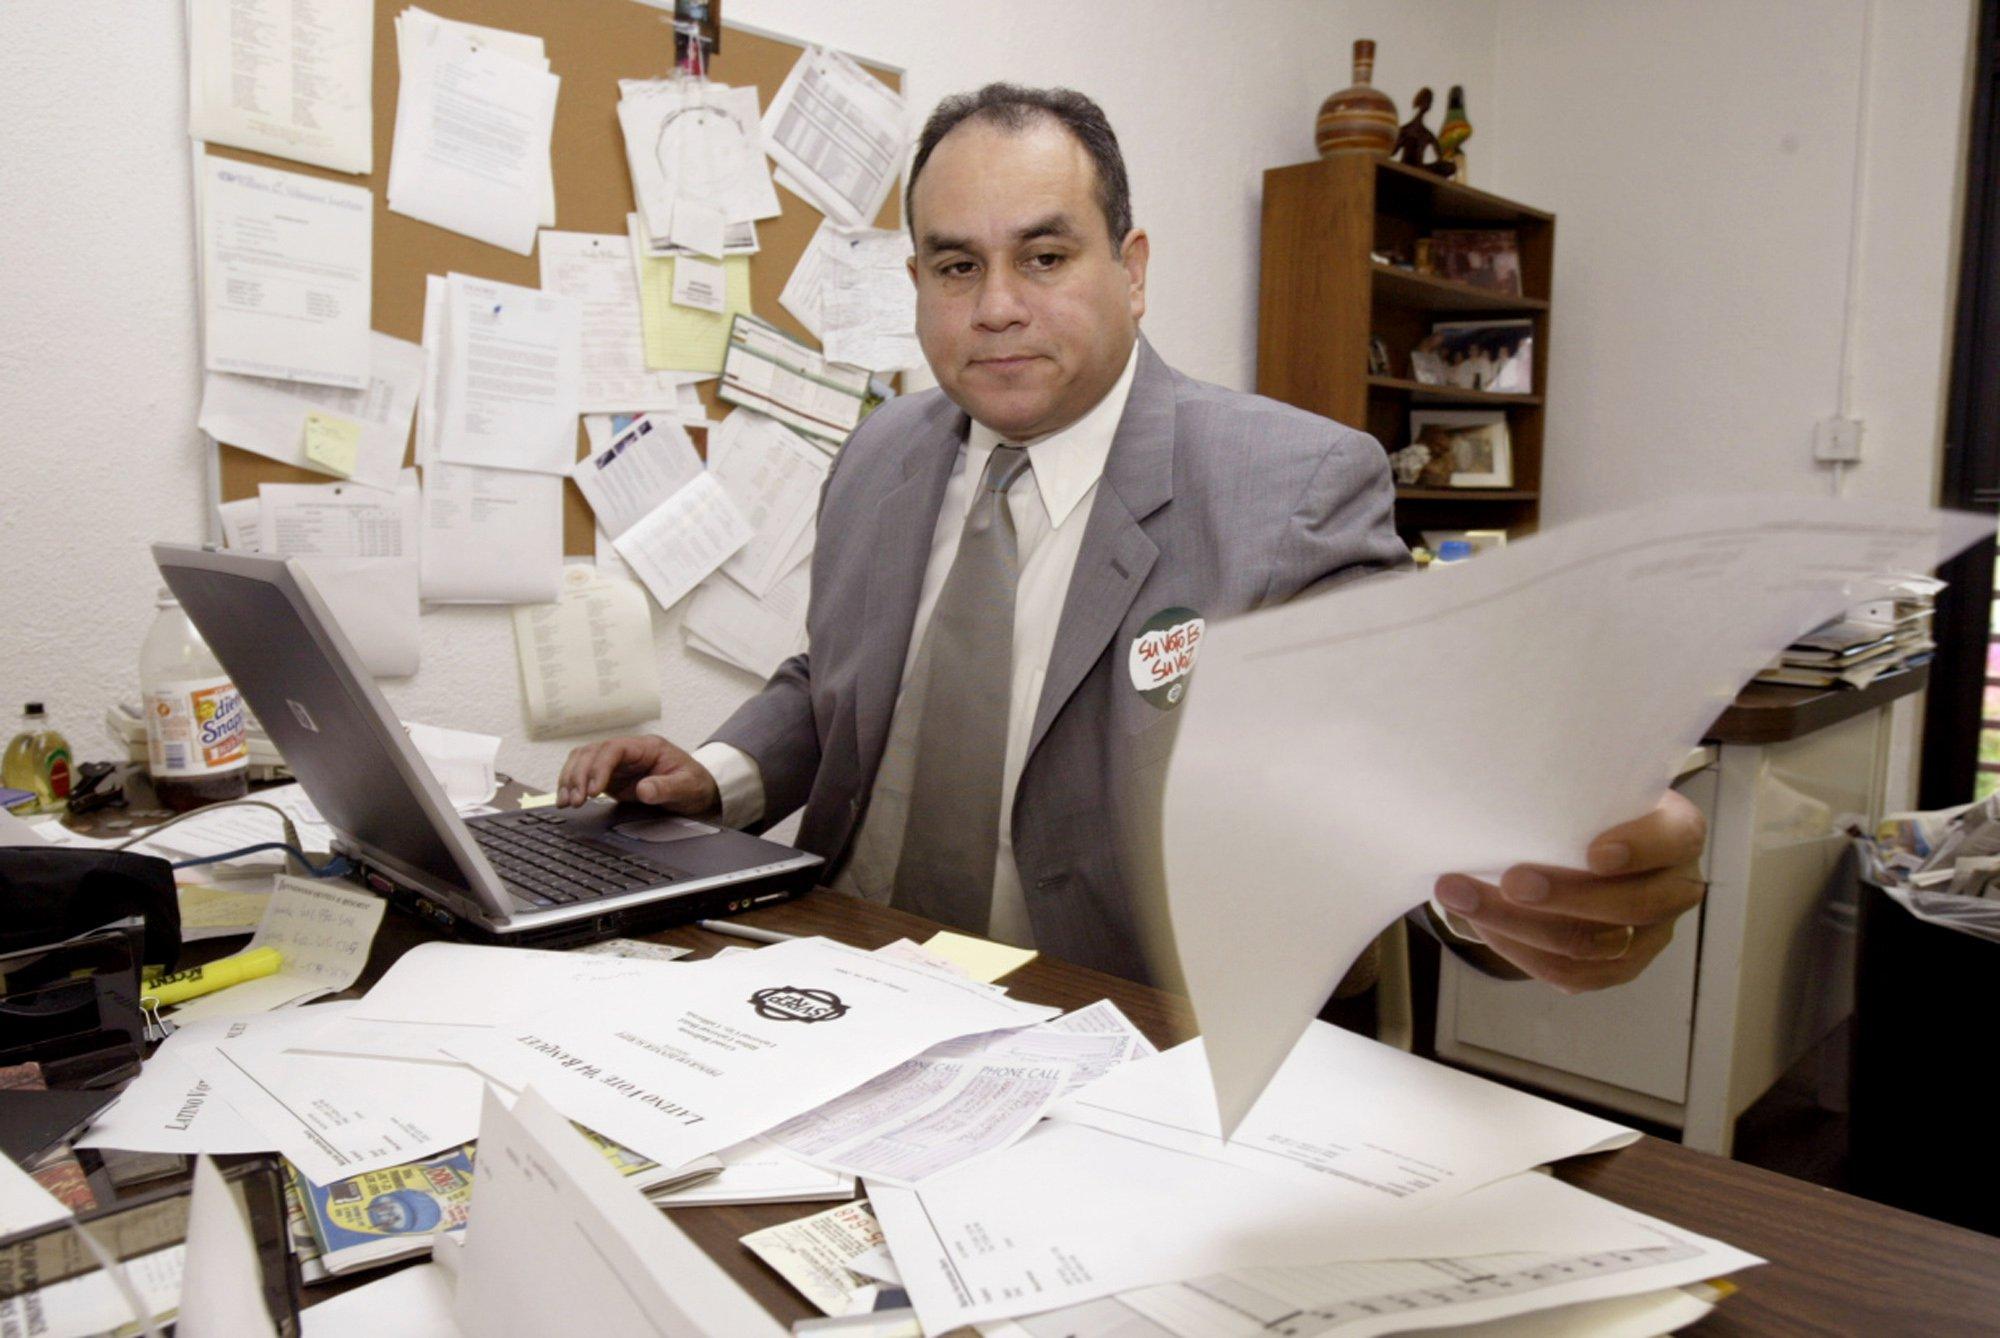 Latino-Hispanic-VotersSouthwest Voter Registration Education Project-Election-2020.jpg